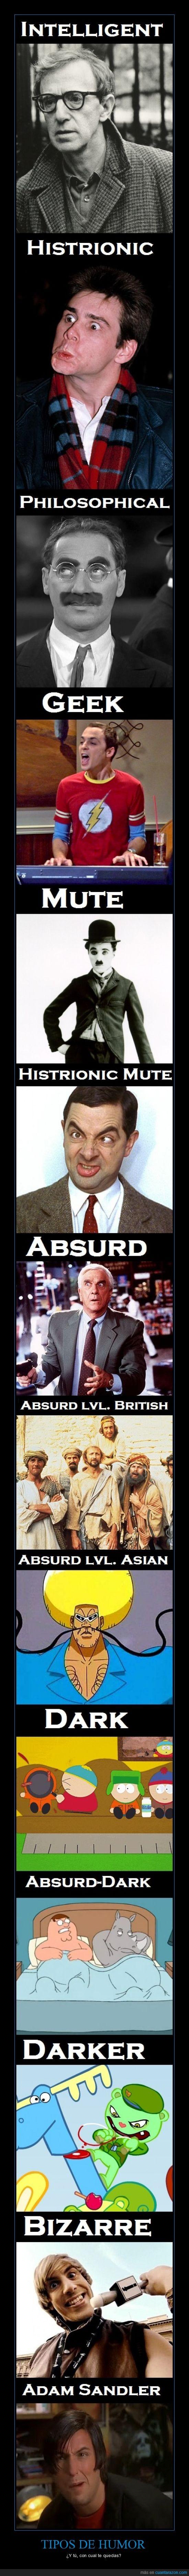 absurdo,Adam Sandler,bizarro,categoria aparte,humor,inteligente,negro